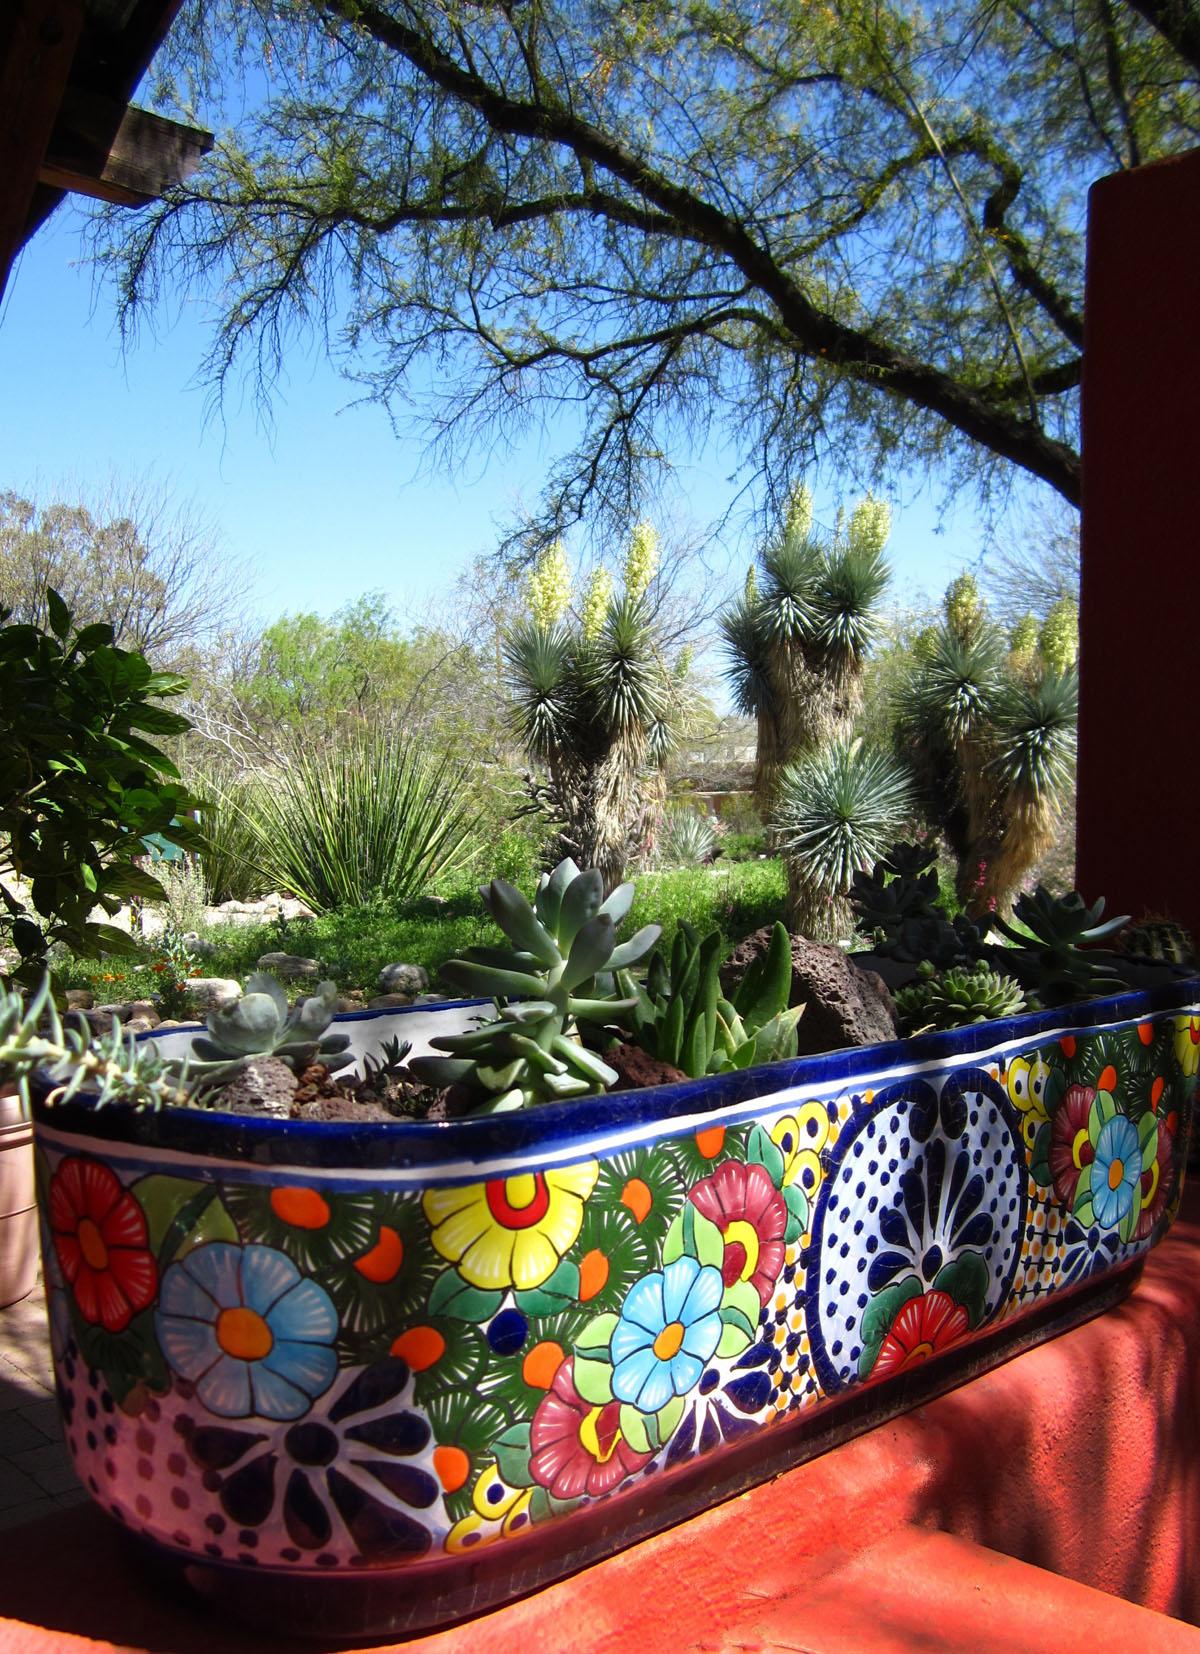 tucson botanical gardens - wikipedia